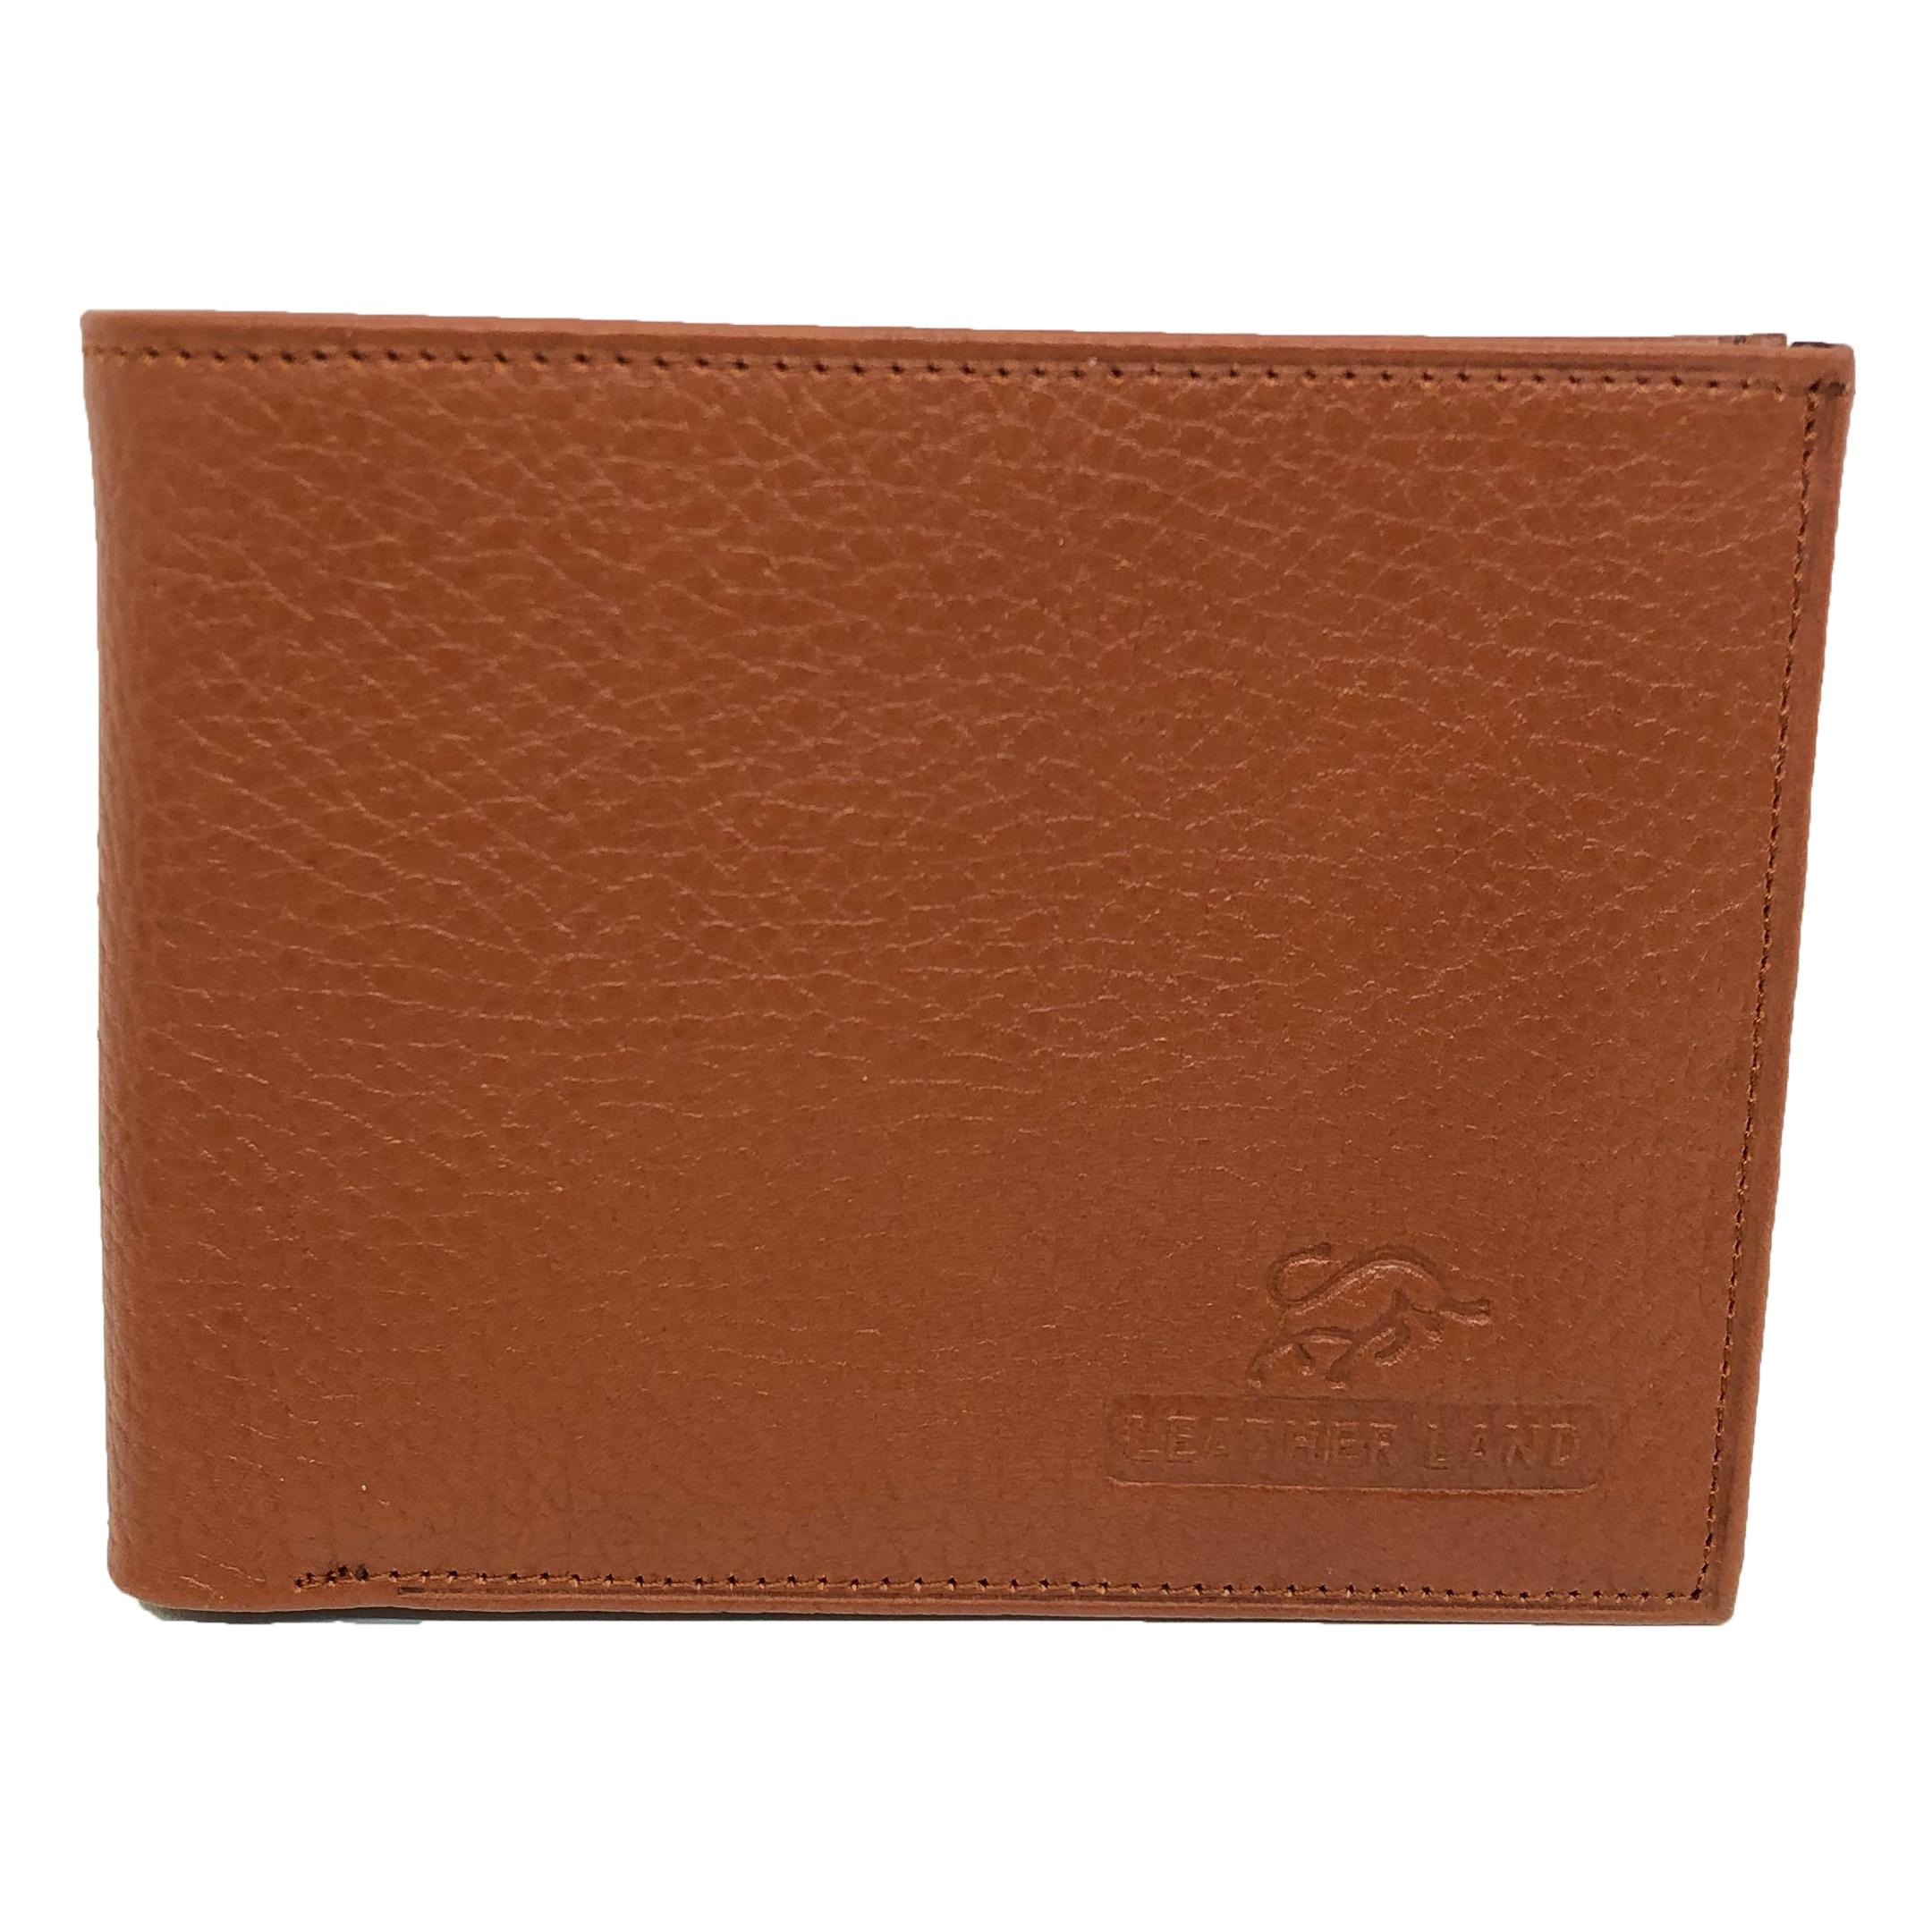 کیف پول مردانه سرزمین چرم مدل 411015